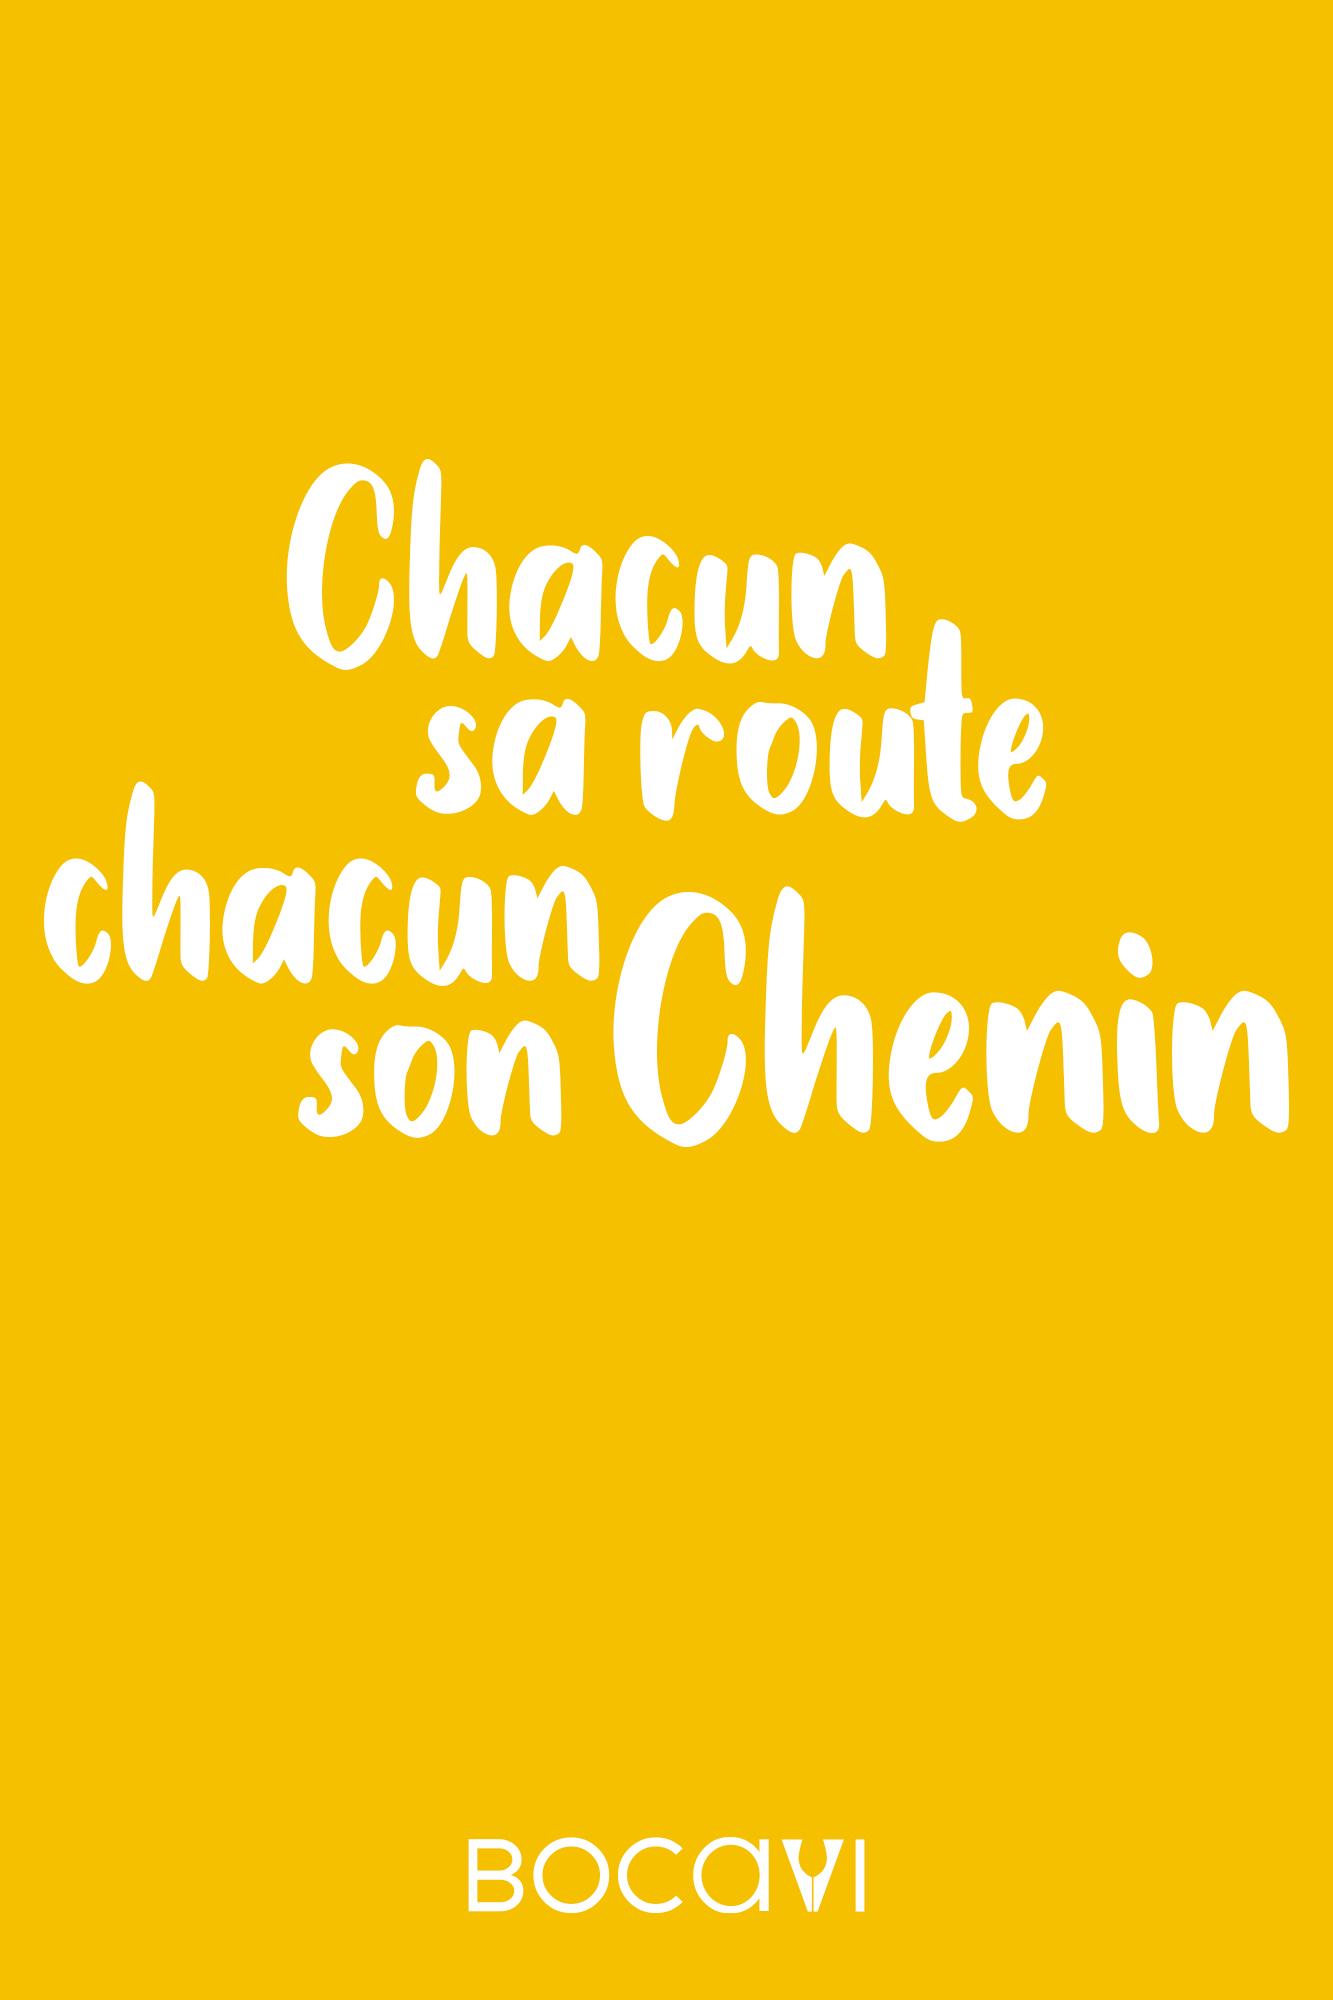 chacun-sa-route-chacun-son-chenin-tonton-david-bocavi-vin-tshirt-sweat